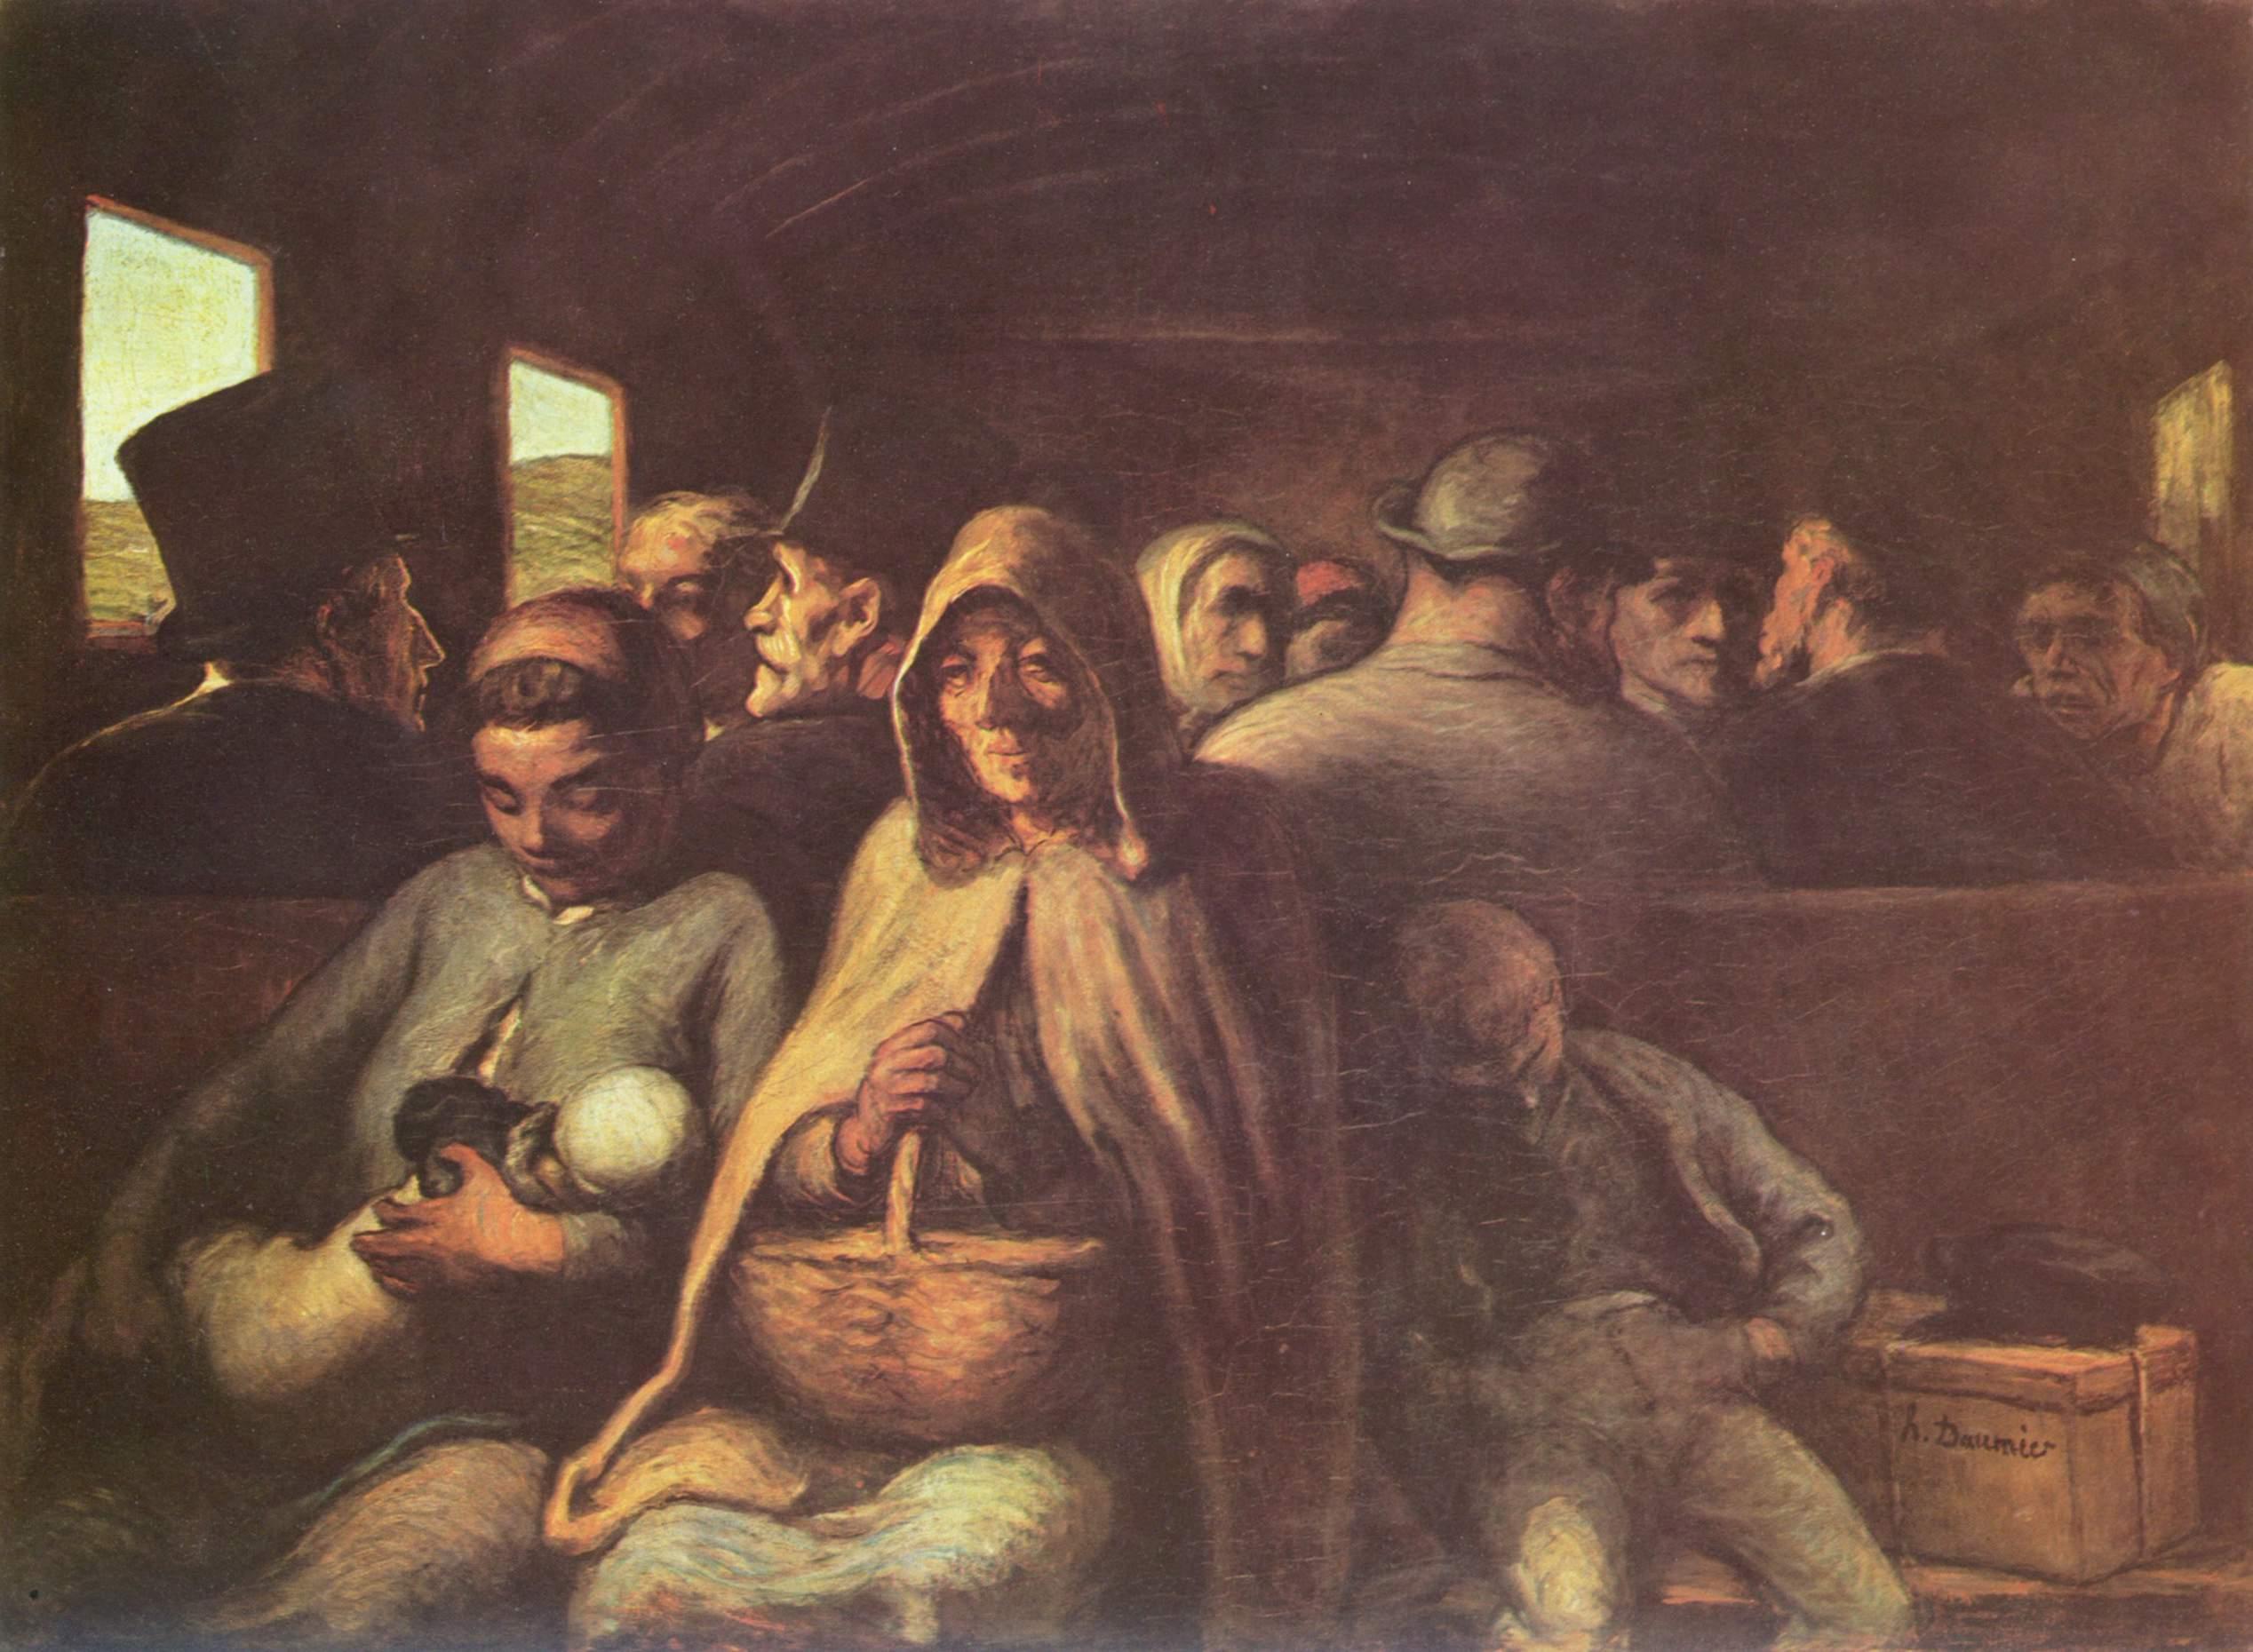 http://fr.academic.ru/pictures/frwiki/72/Honoré_Daumier_034.jpg